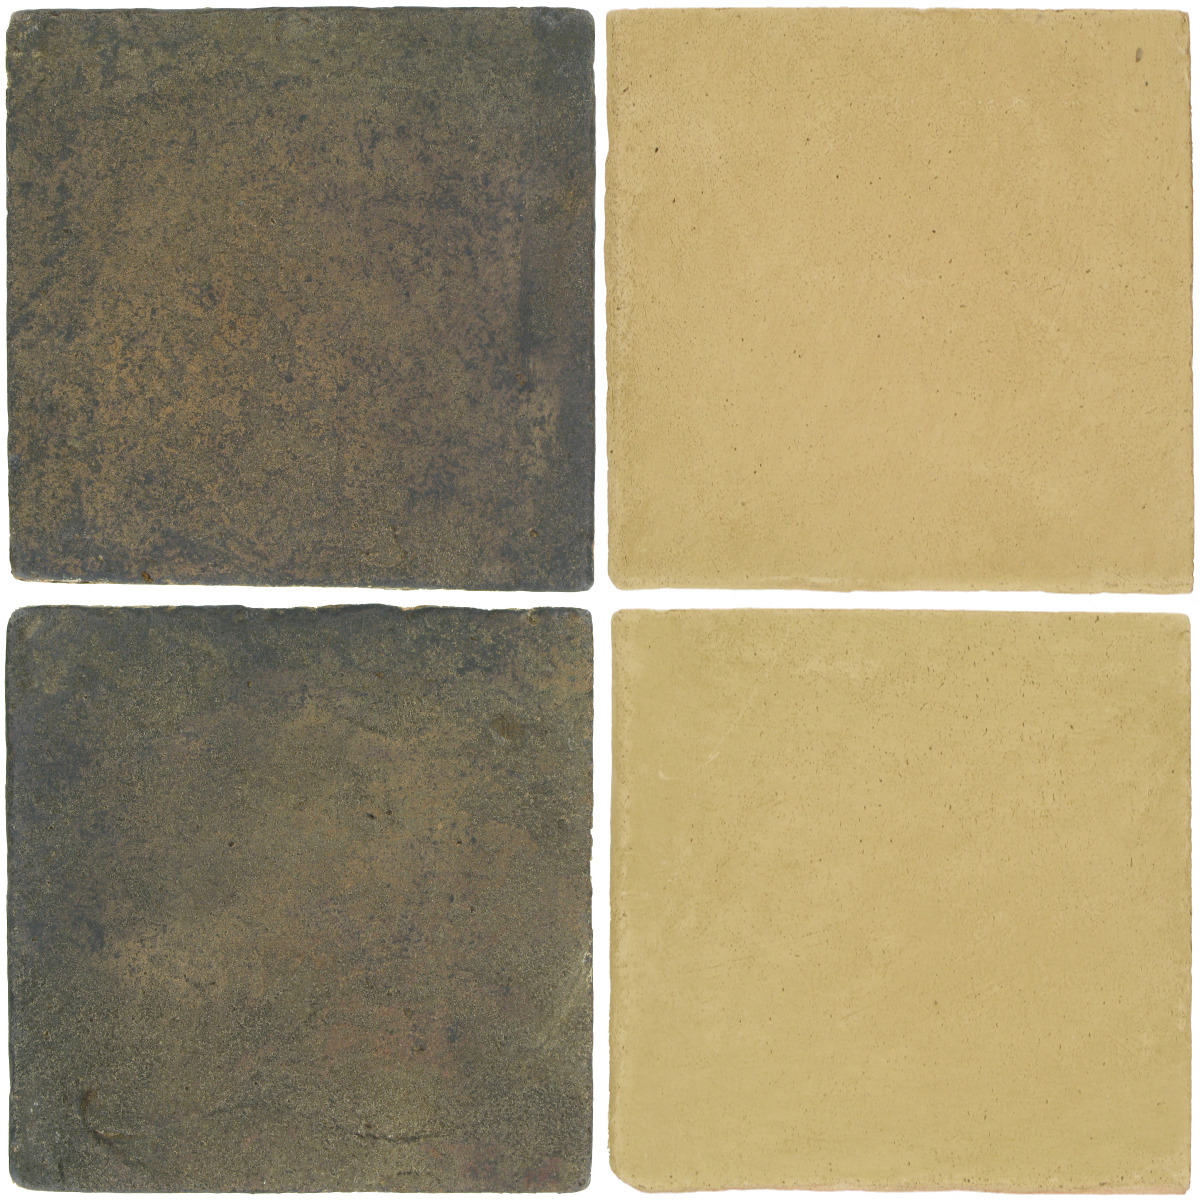 Pedralbes Antique Terracotta  2 Color Combinations  VTG-PSTG Terra Grey + OHS-PGGW Golden W.